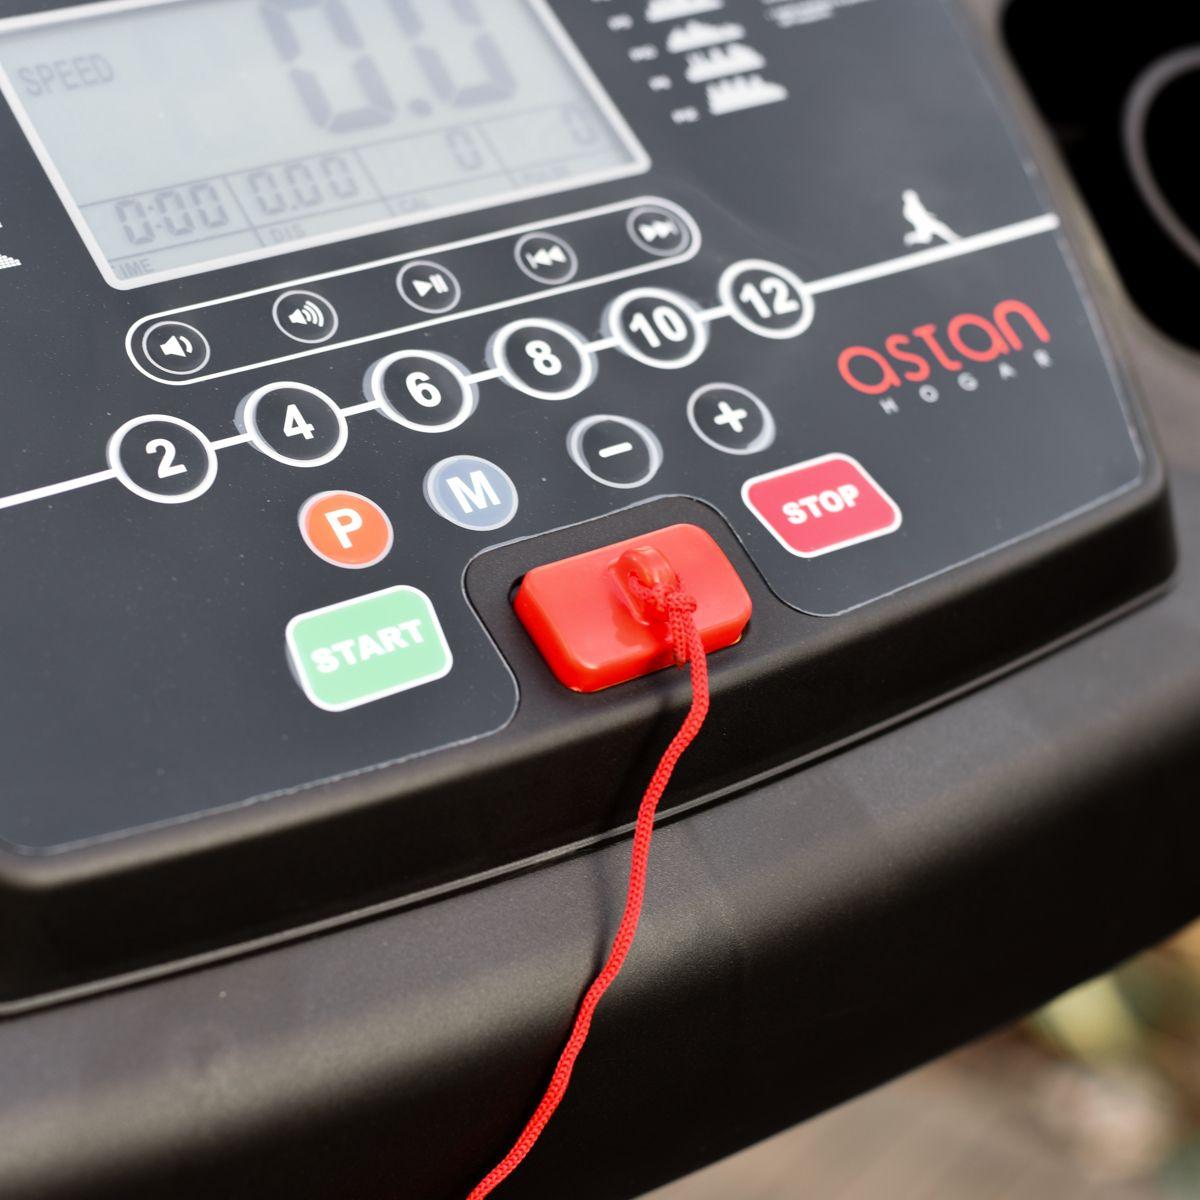 Cinta de correr Runny X-Treme Plus con motor continuo 1500W AH-FT1050 13